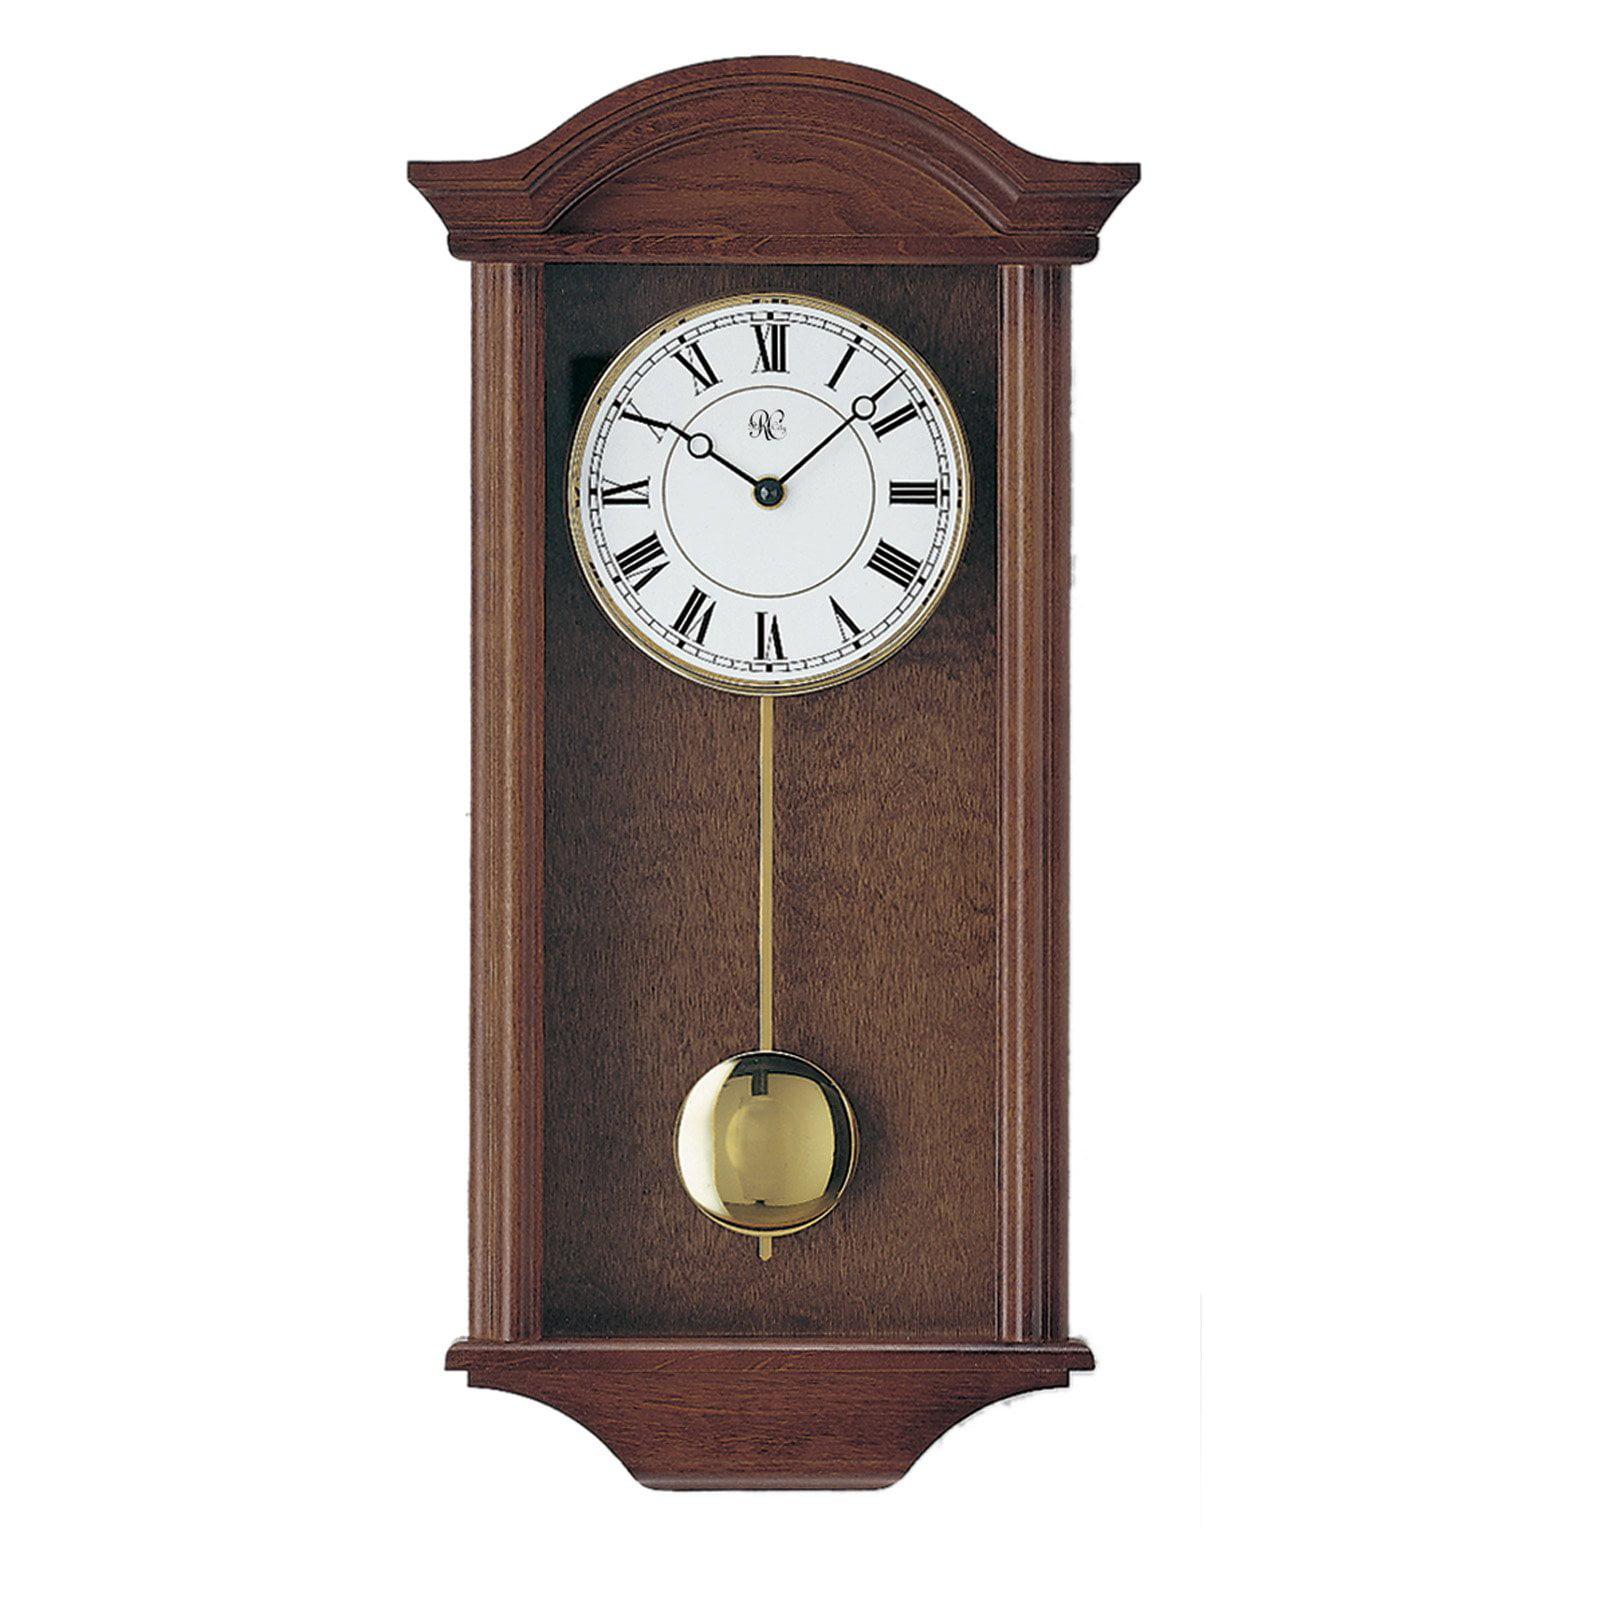 River City Clocks Walnut Chiming Wall Clock by River City Clocks